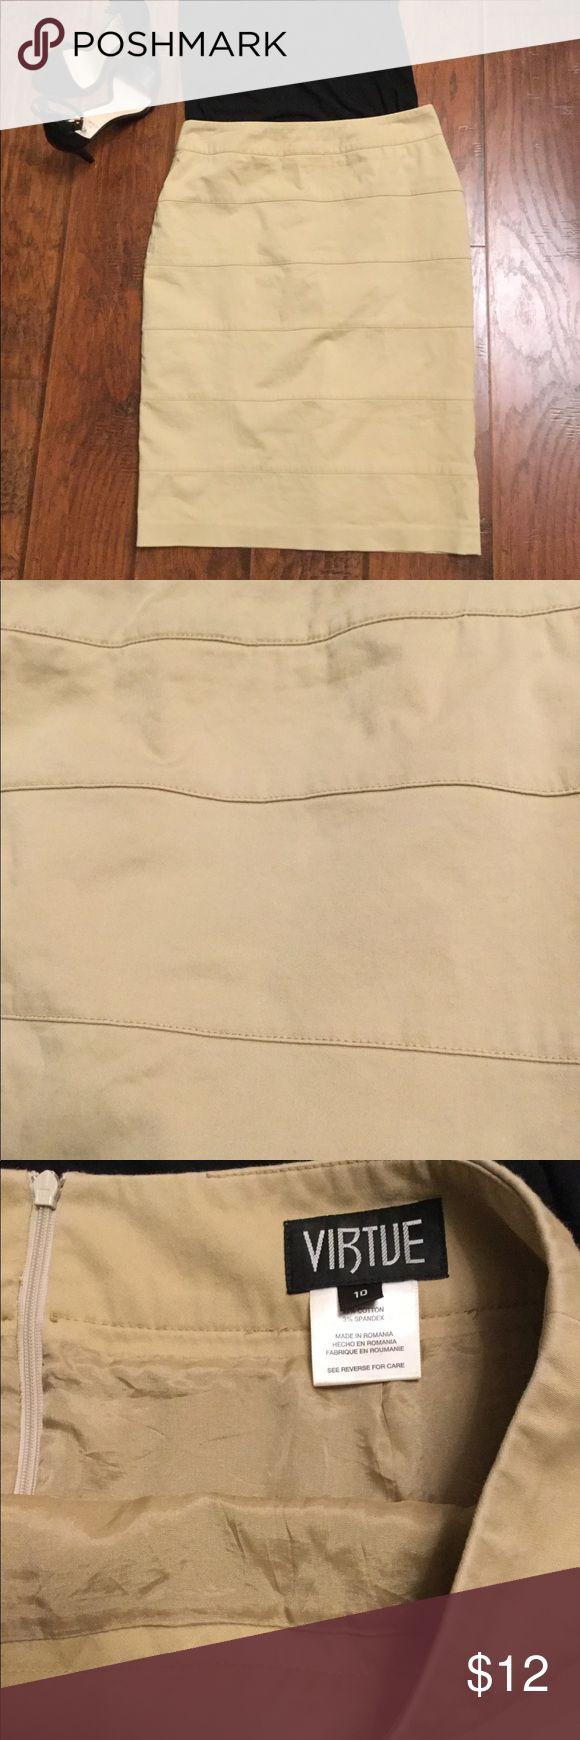 "Khaki Pencil Skirt Khaki colored banded Pencil skirt. Size 10 Fully lined  cotton/spandex blend Back zip closure with bottom slit. 24"" long Virtue Skirts Midi"